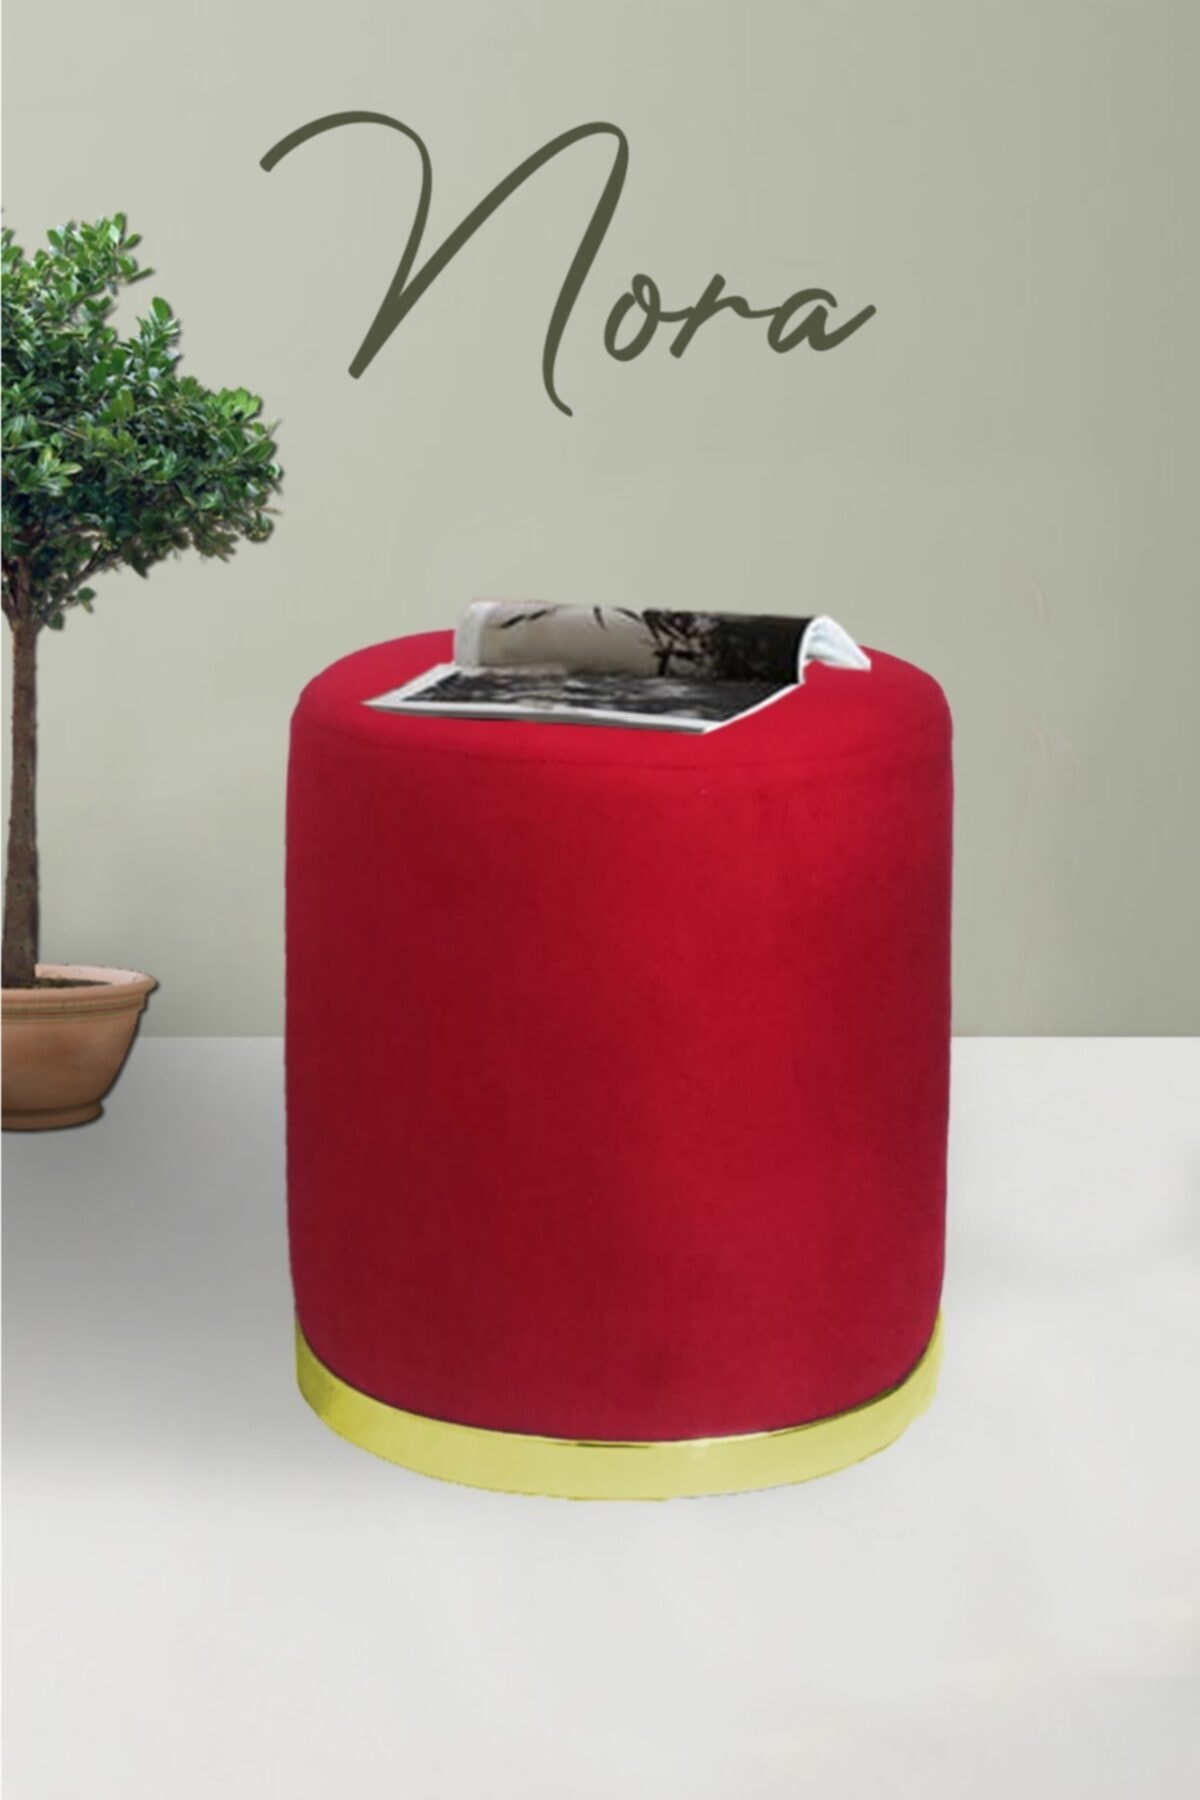 Zem Nora Silinebilir Puf - Red Gold 1